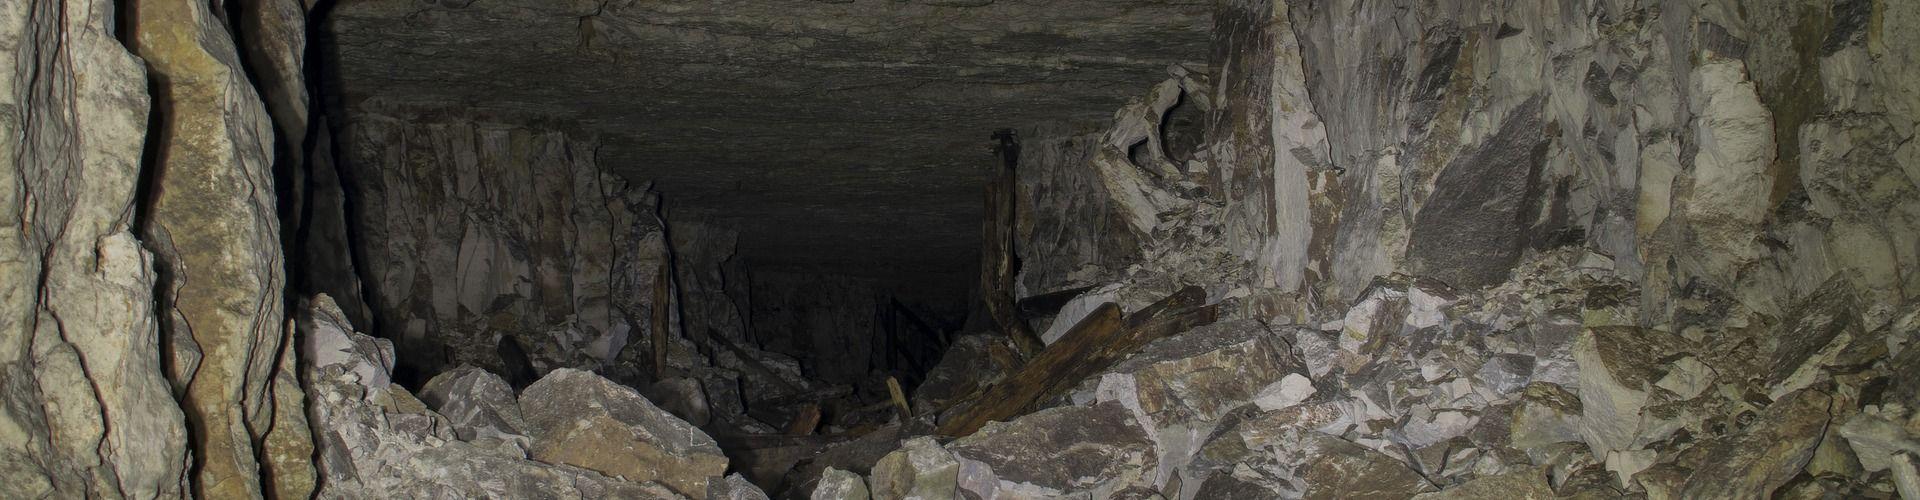 cave-1880282_1920cropo